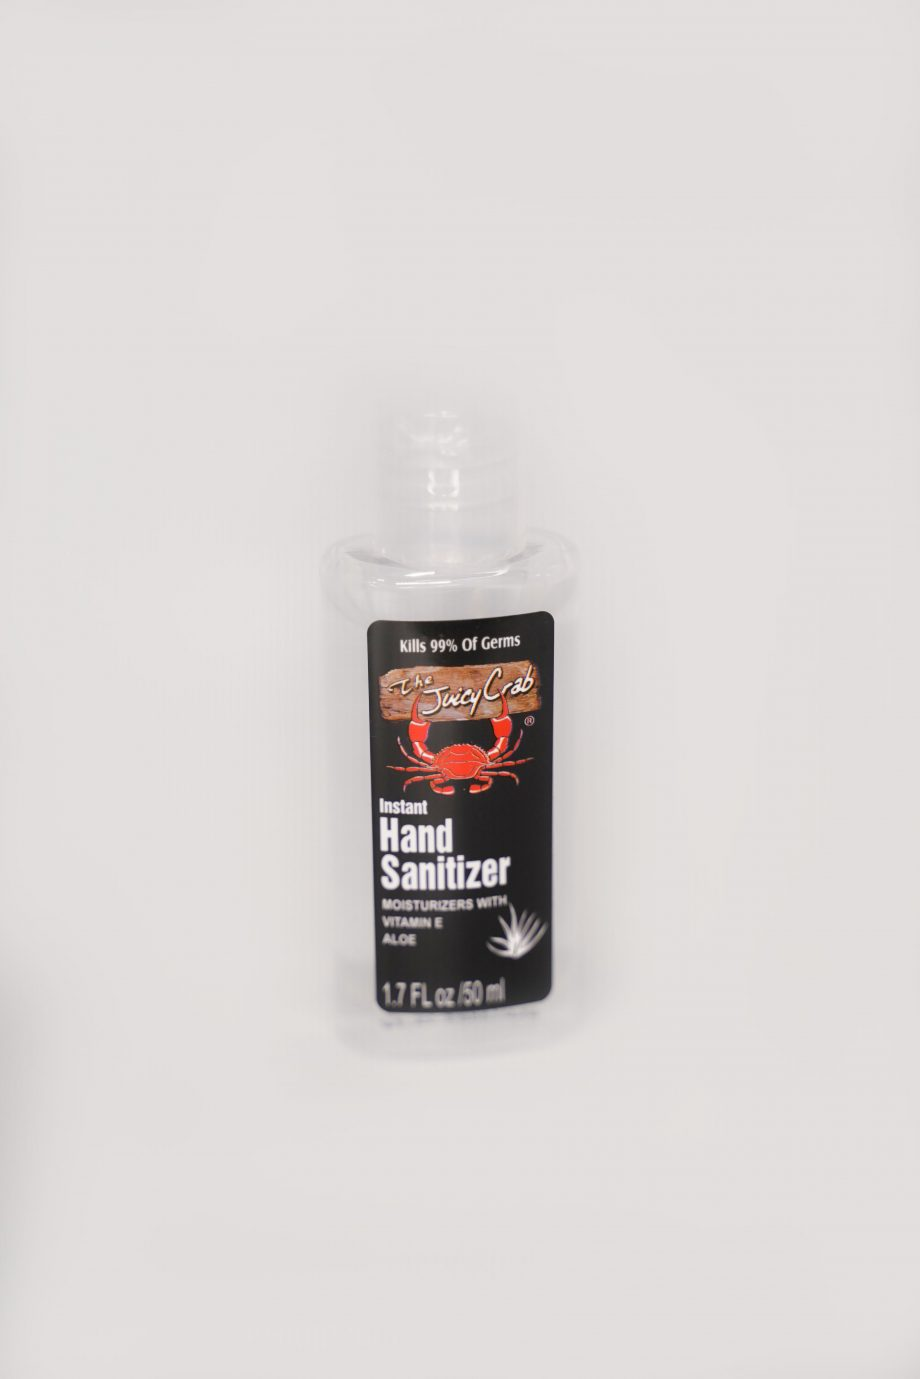 aloe vera gel alcohol hand sanitizer